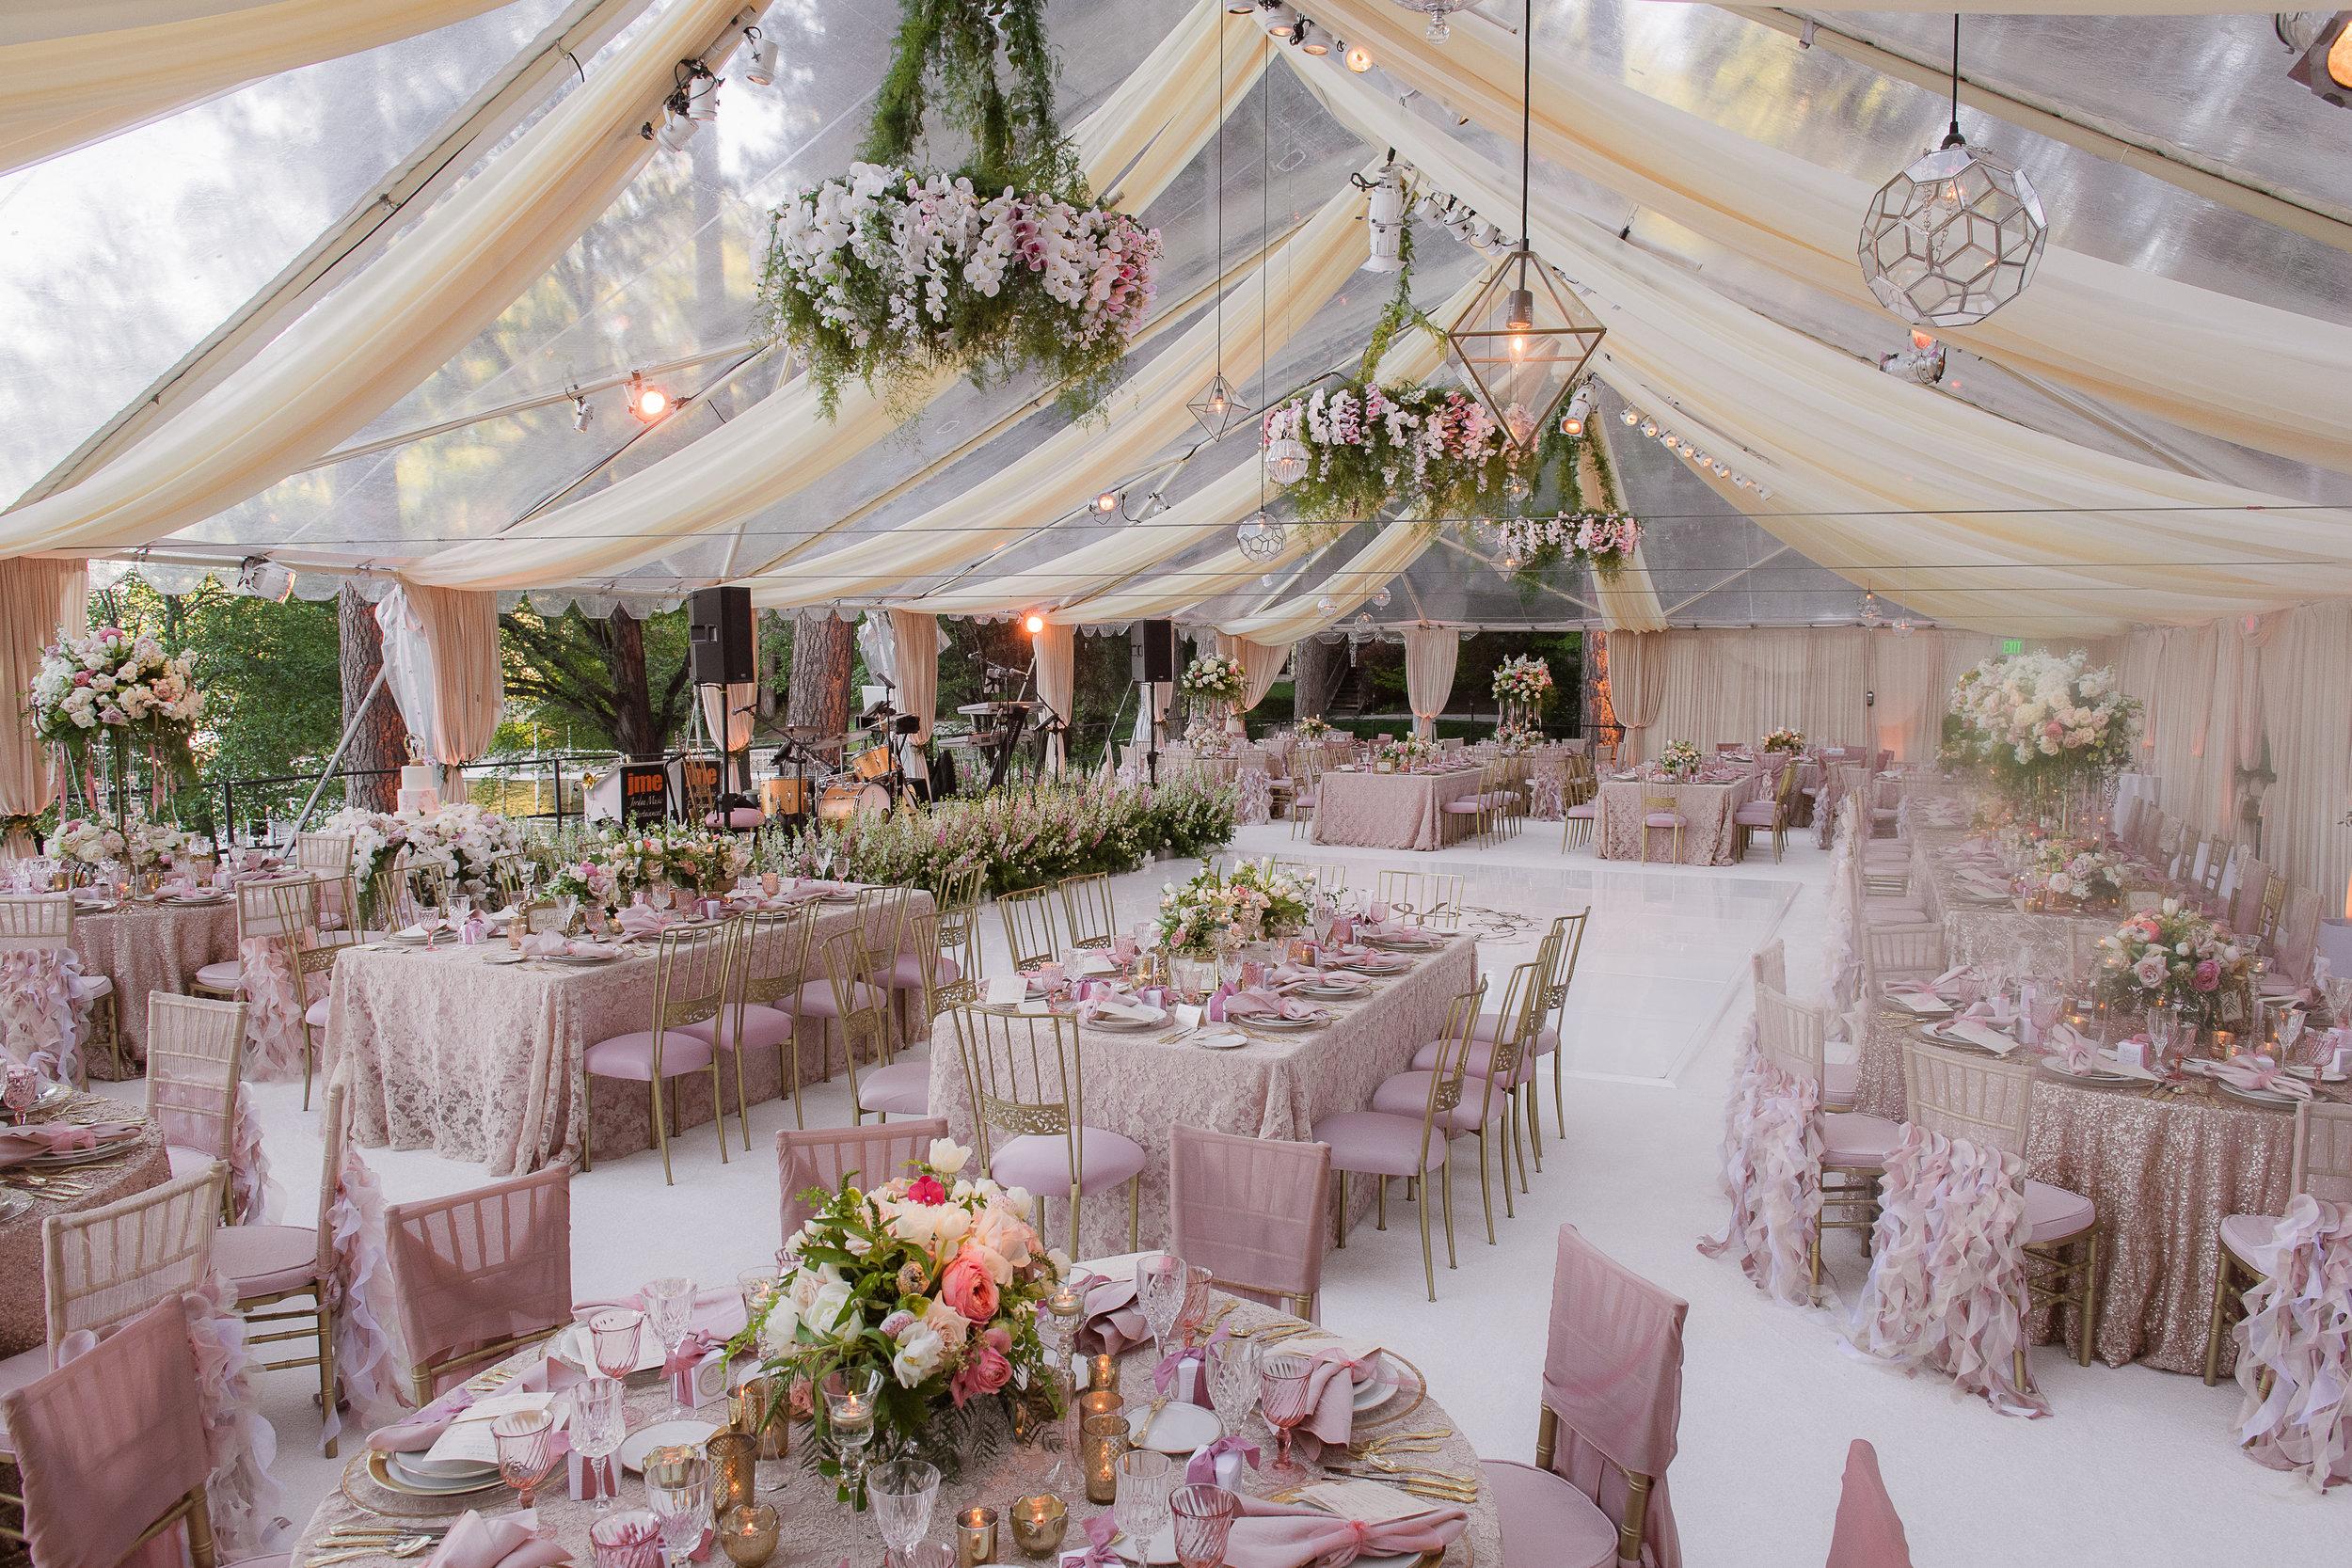 Lake arrowhead wedding tent.jpg